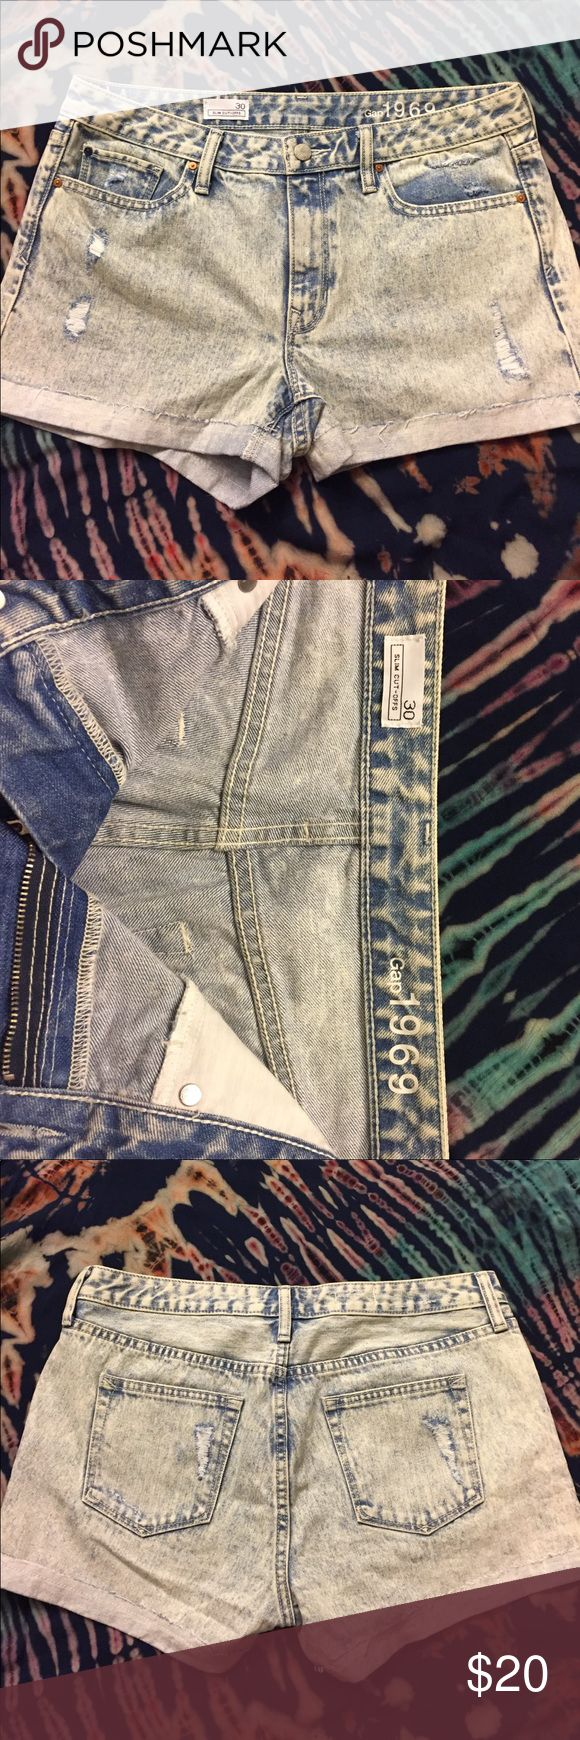 Gap Acid Wash Distressed Jean Shorts NWOT Gap acid washed jean shorts. Light distress on front and back pockets. GAP Shorts Jean Shorts